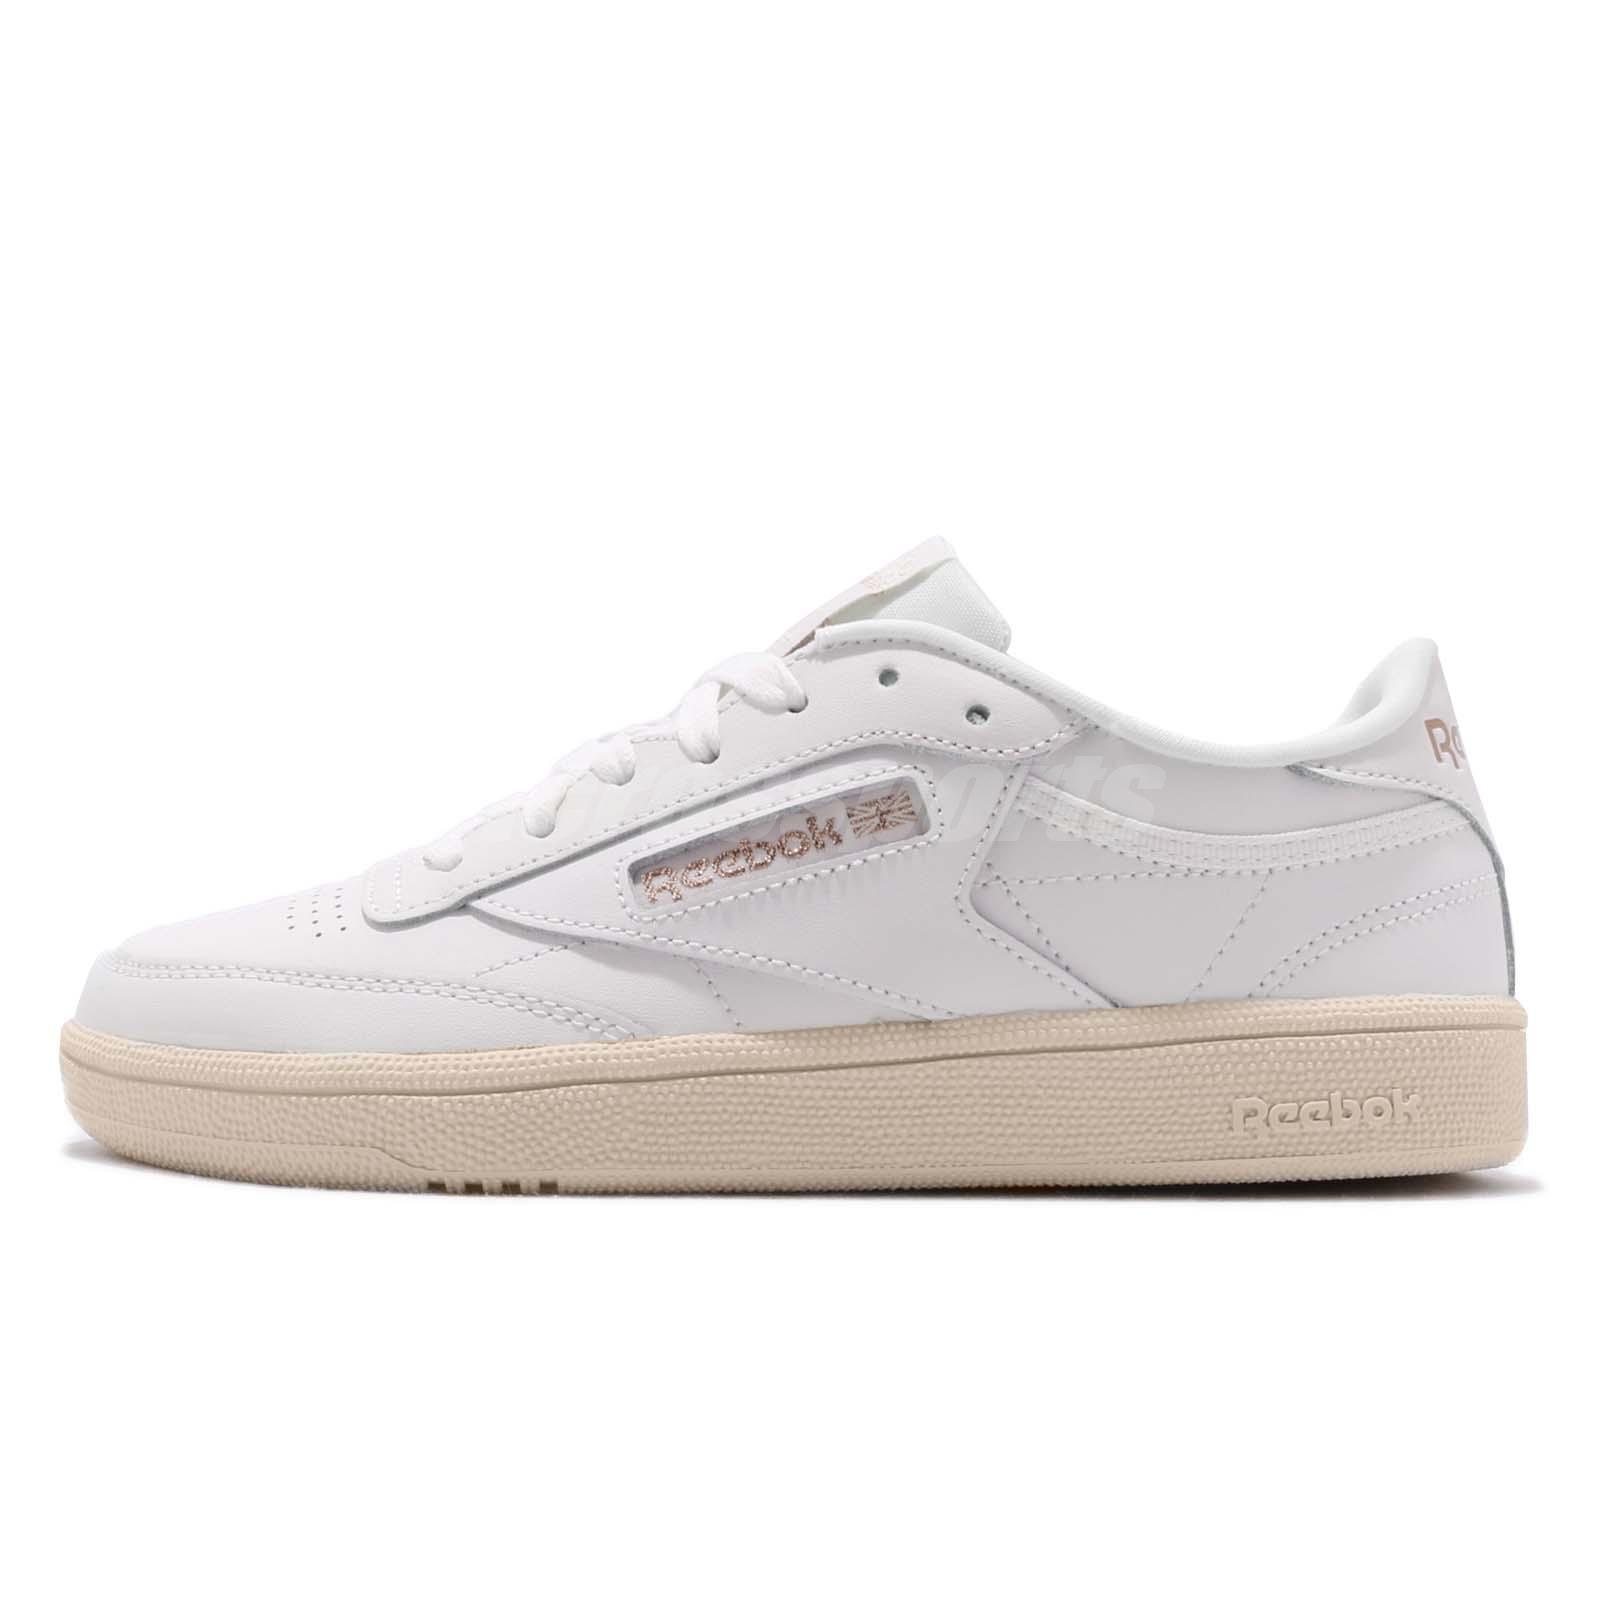 e4594186173 Reebok Club C 85 Chalk Rose Gold Paper White Women Classic Casual Shoes  DV3727